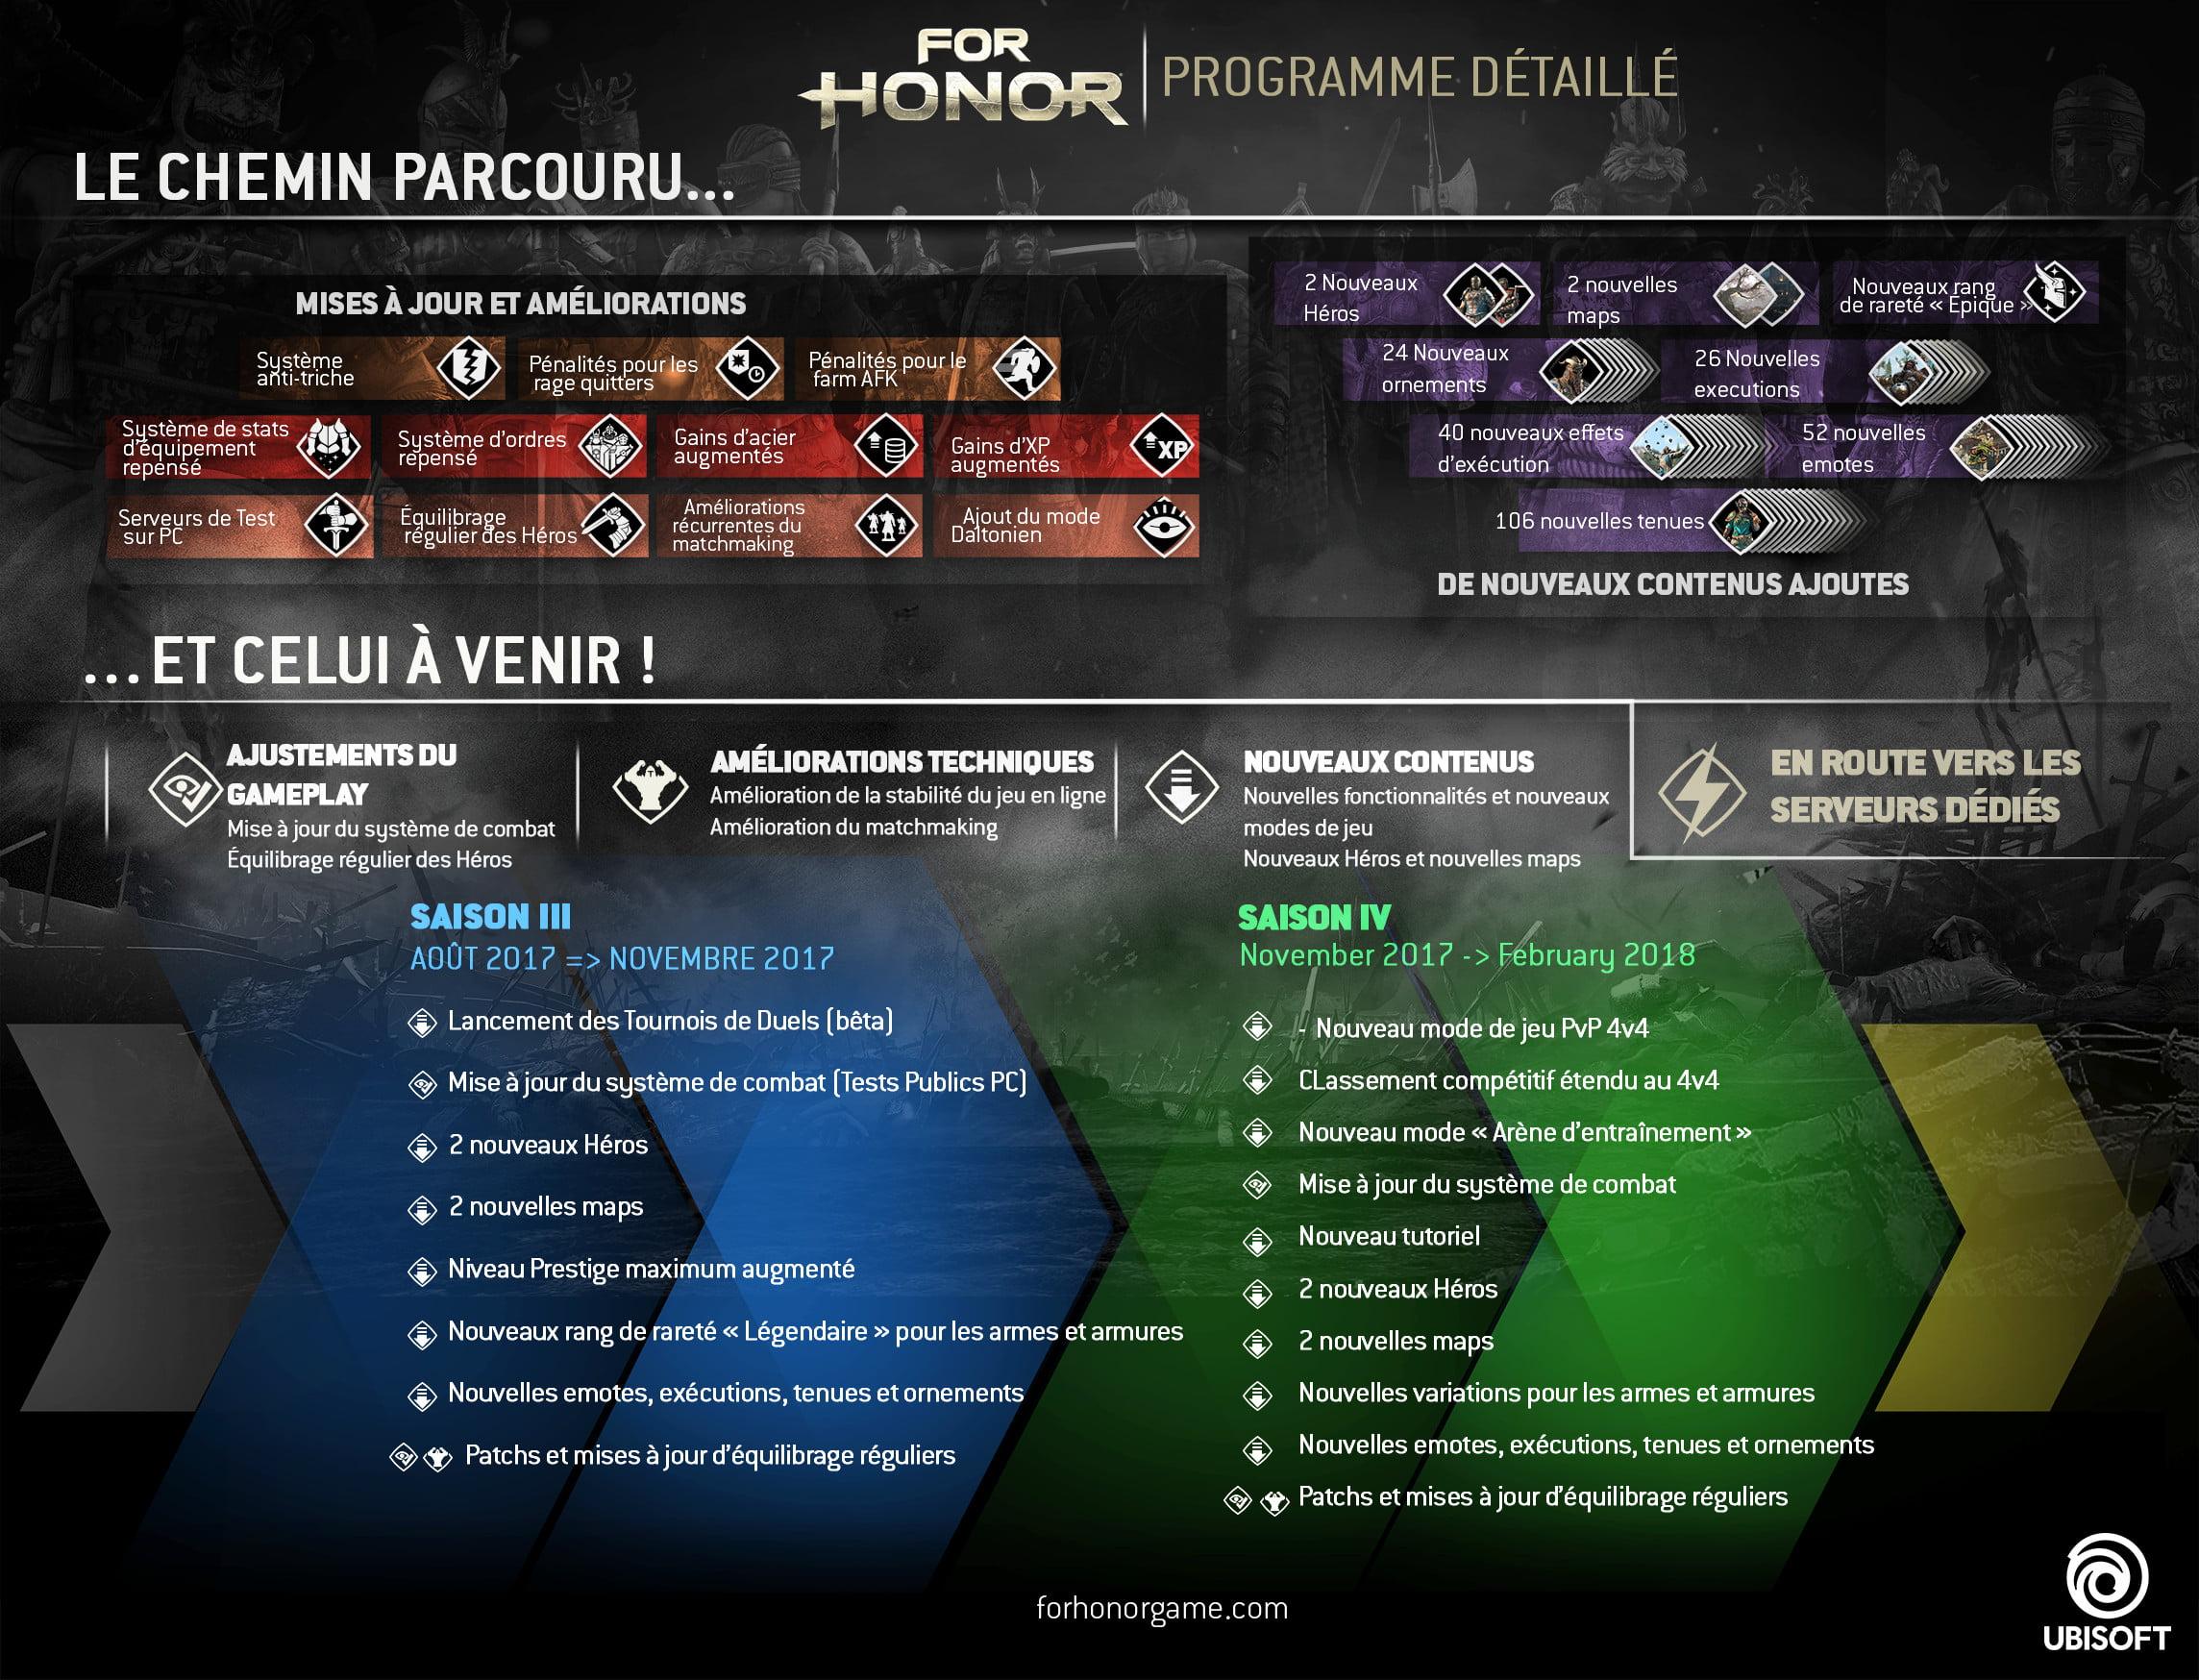 fh_roadmap_all_fr